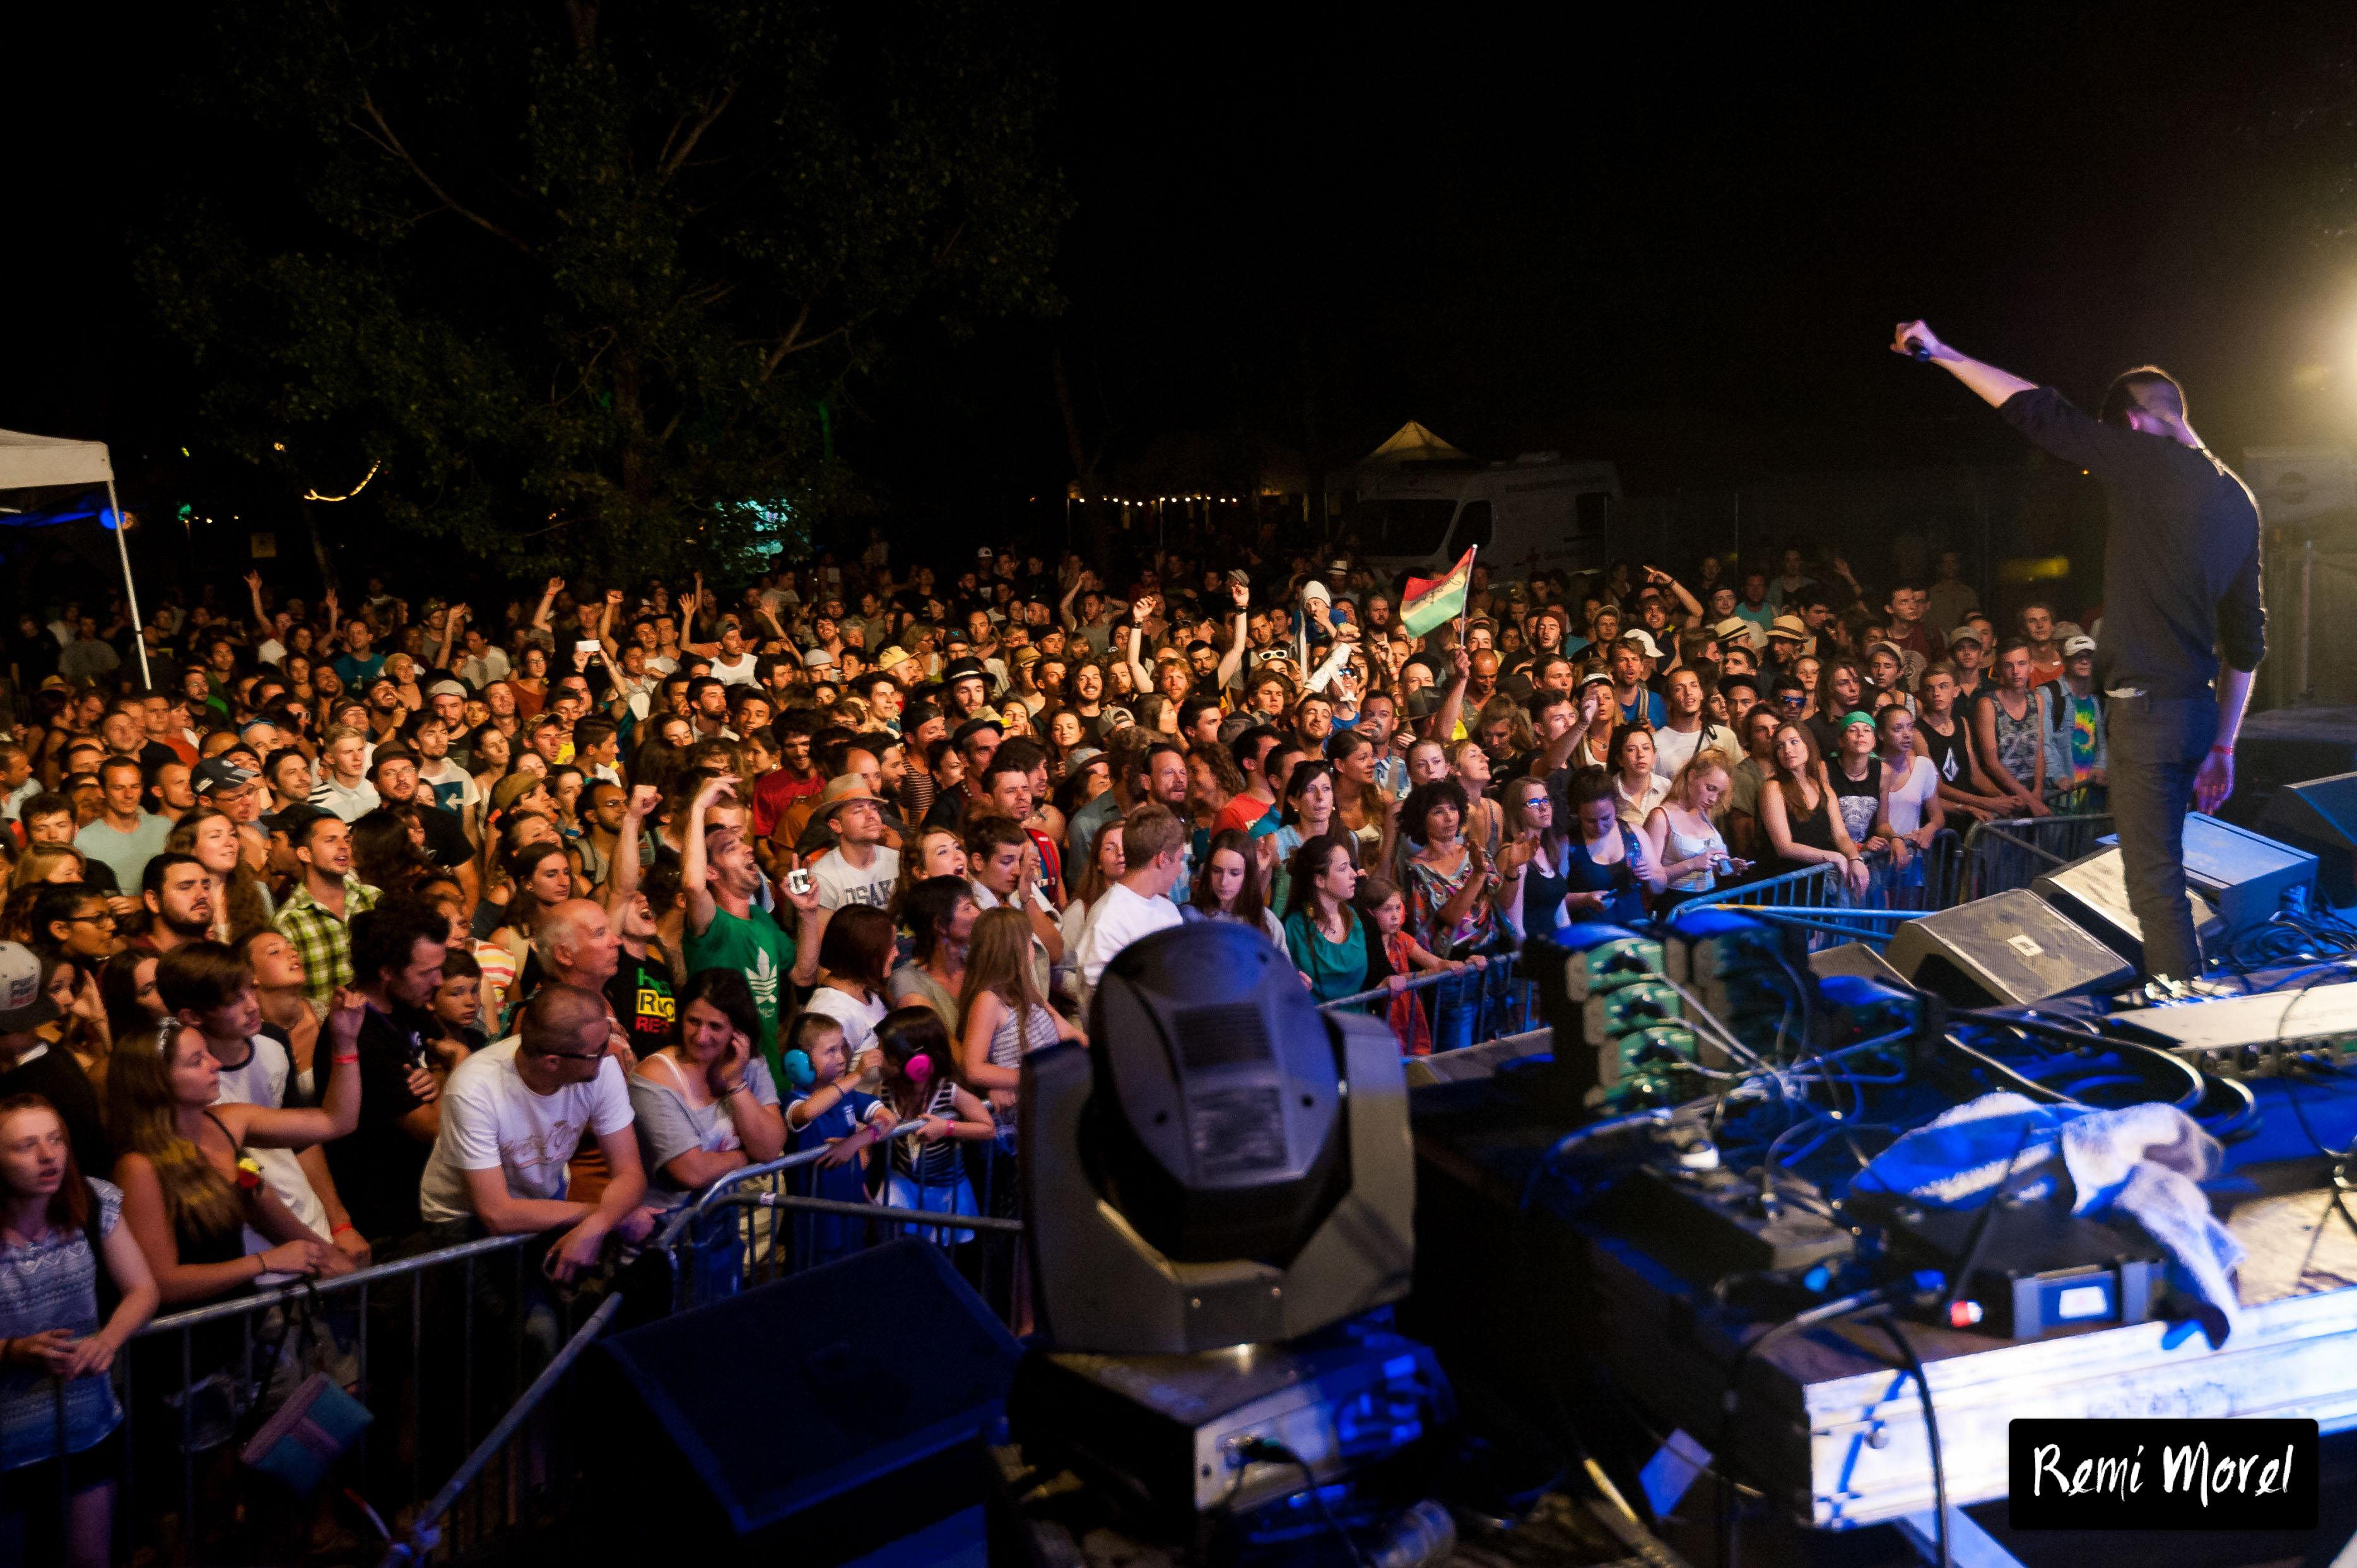 remi-morel-tradin-festival-biga-ranx-10